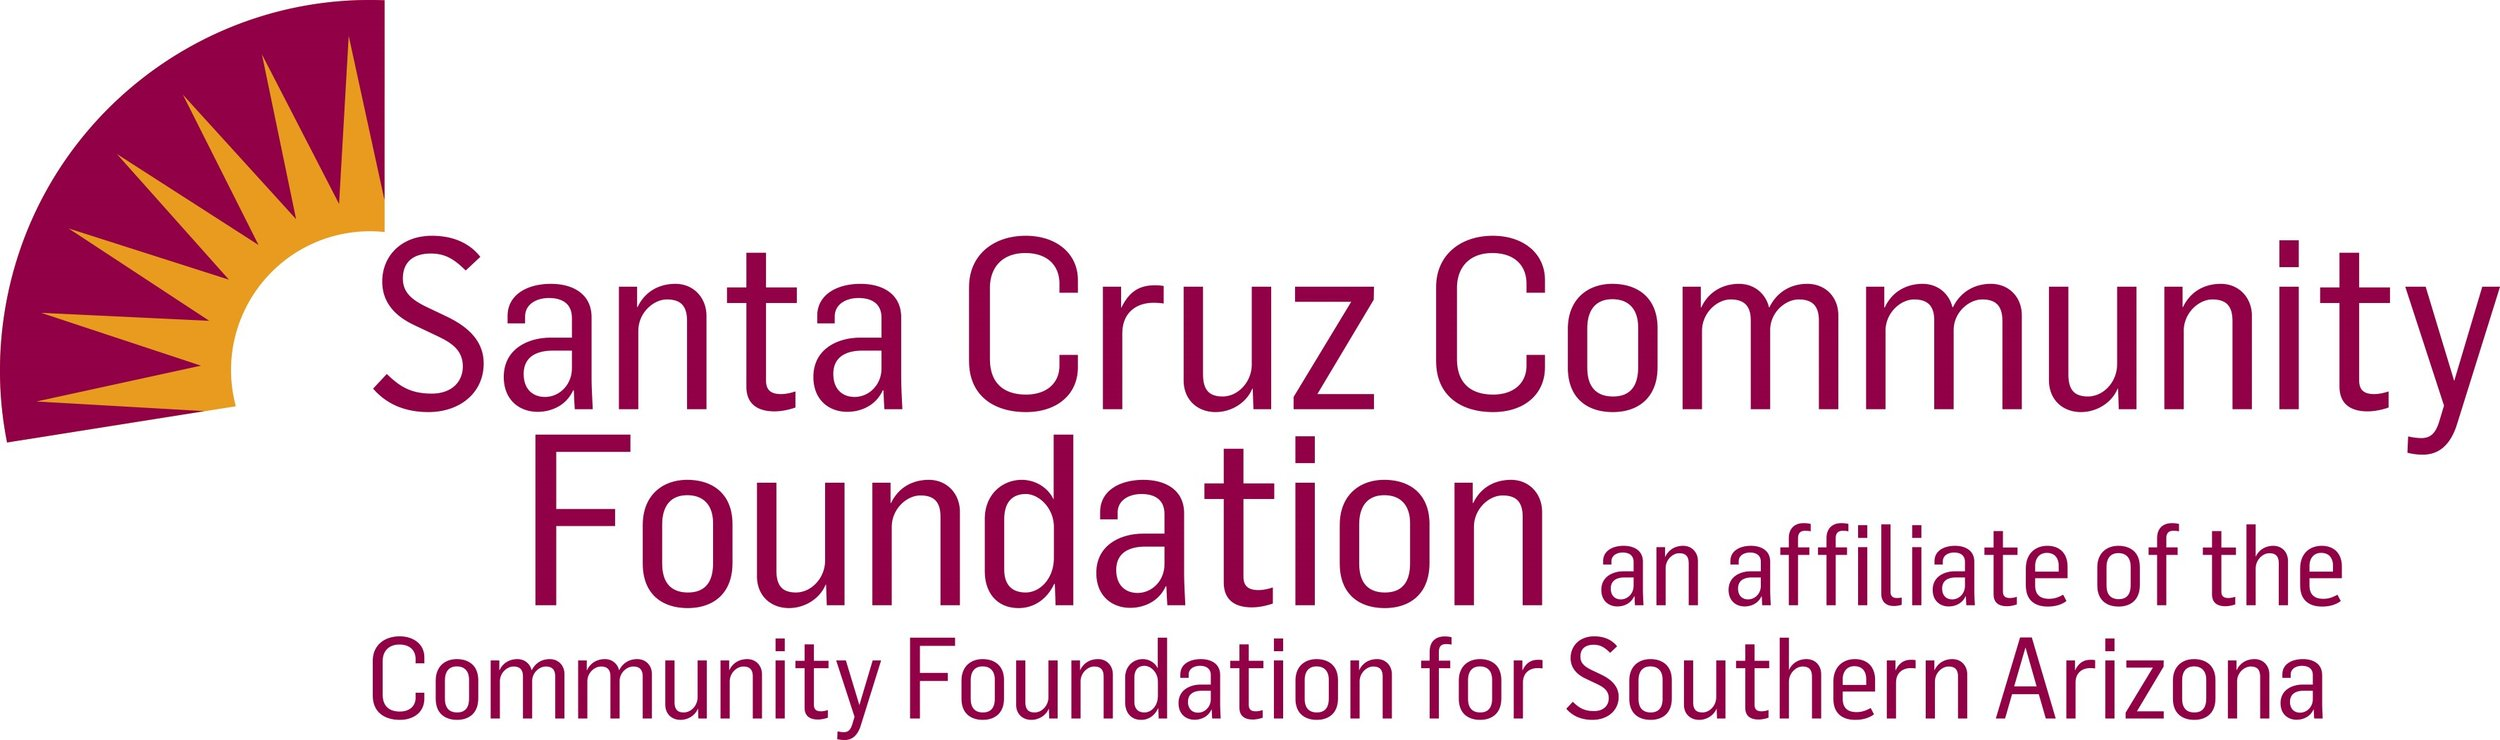 Santa Cruz Co Community Foundation.jpg